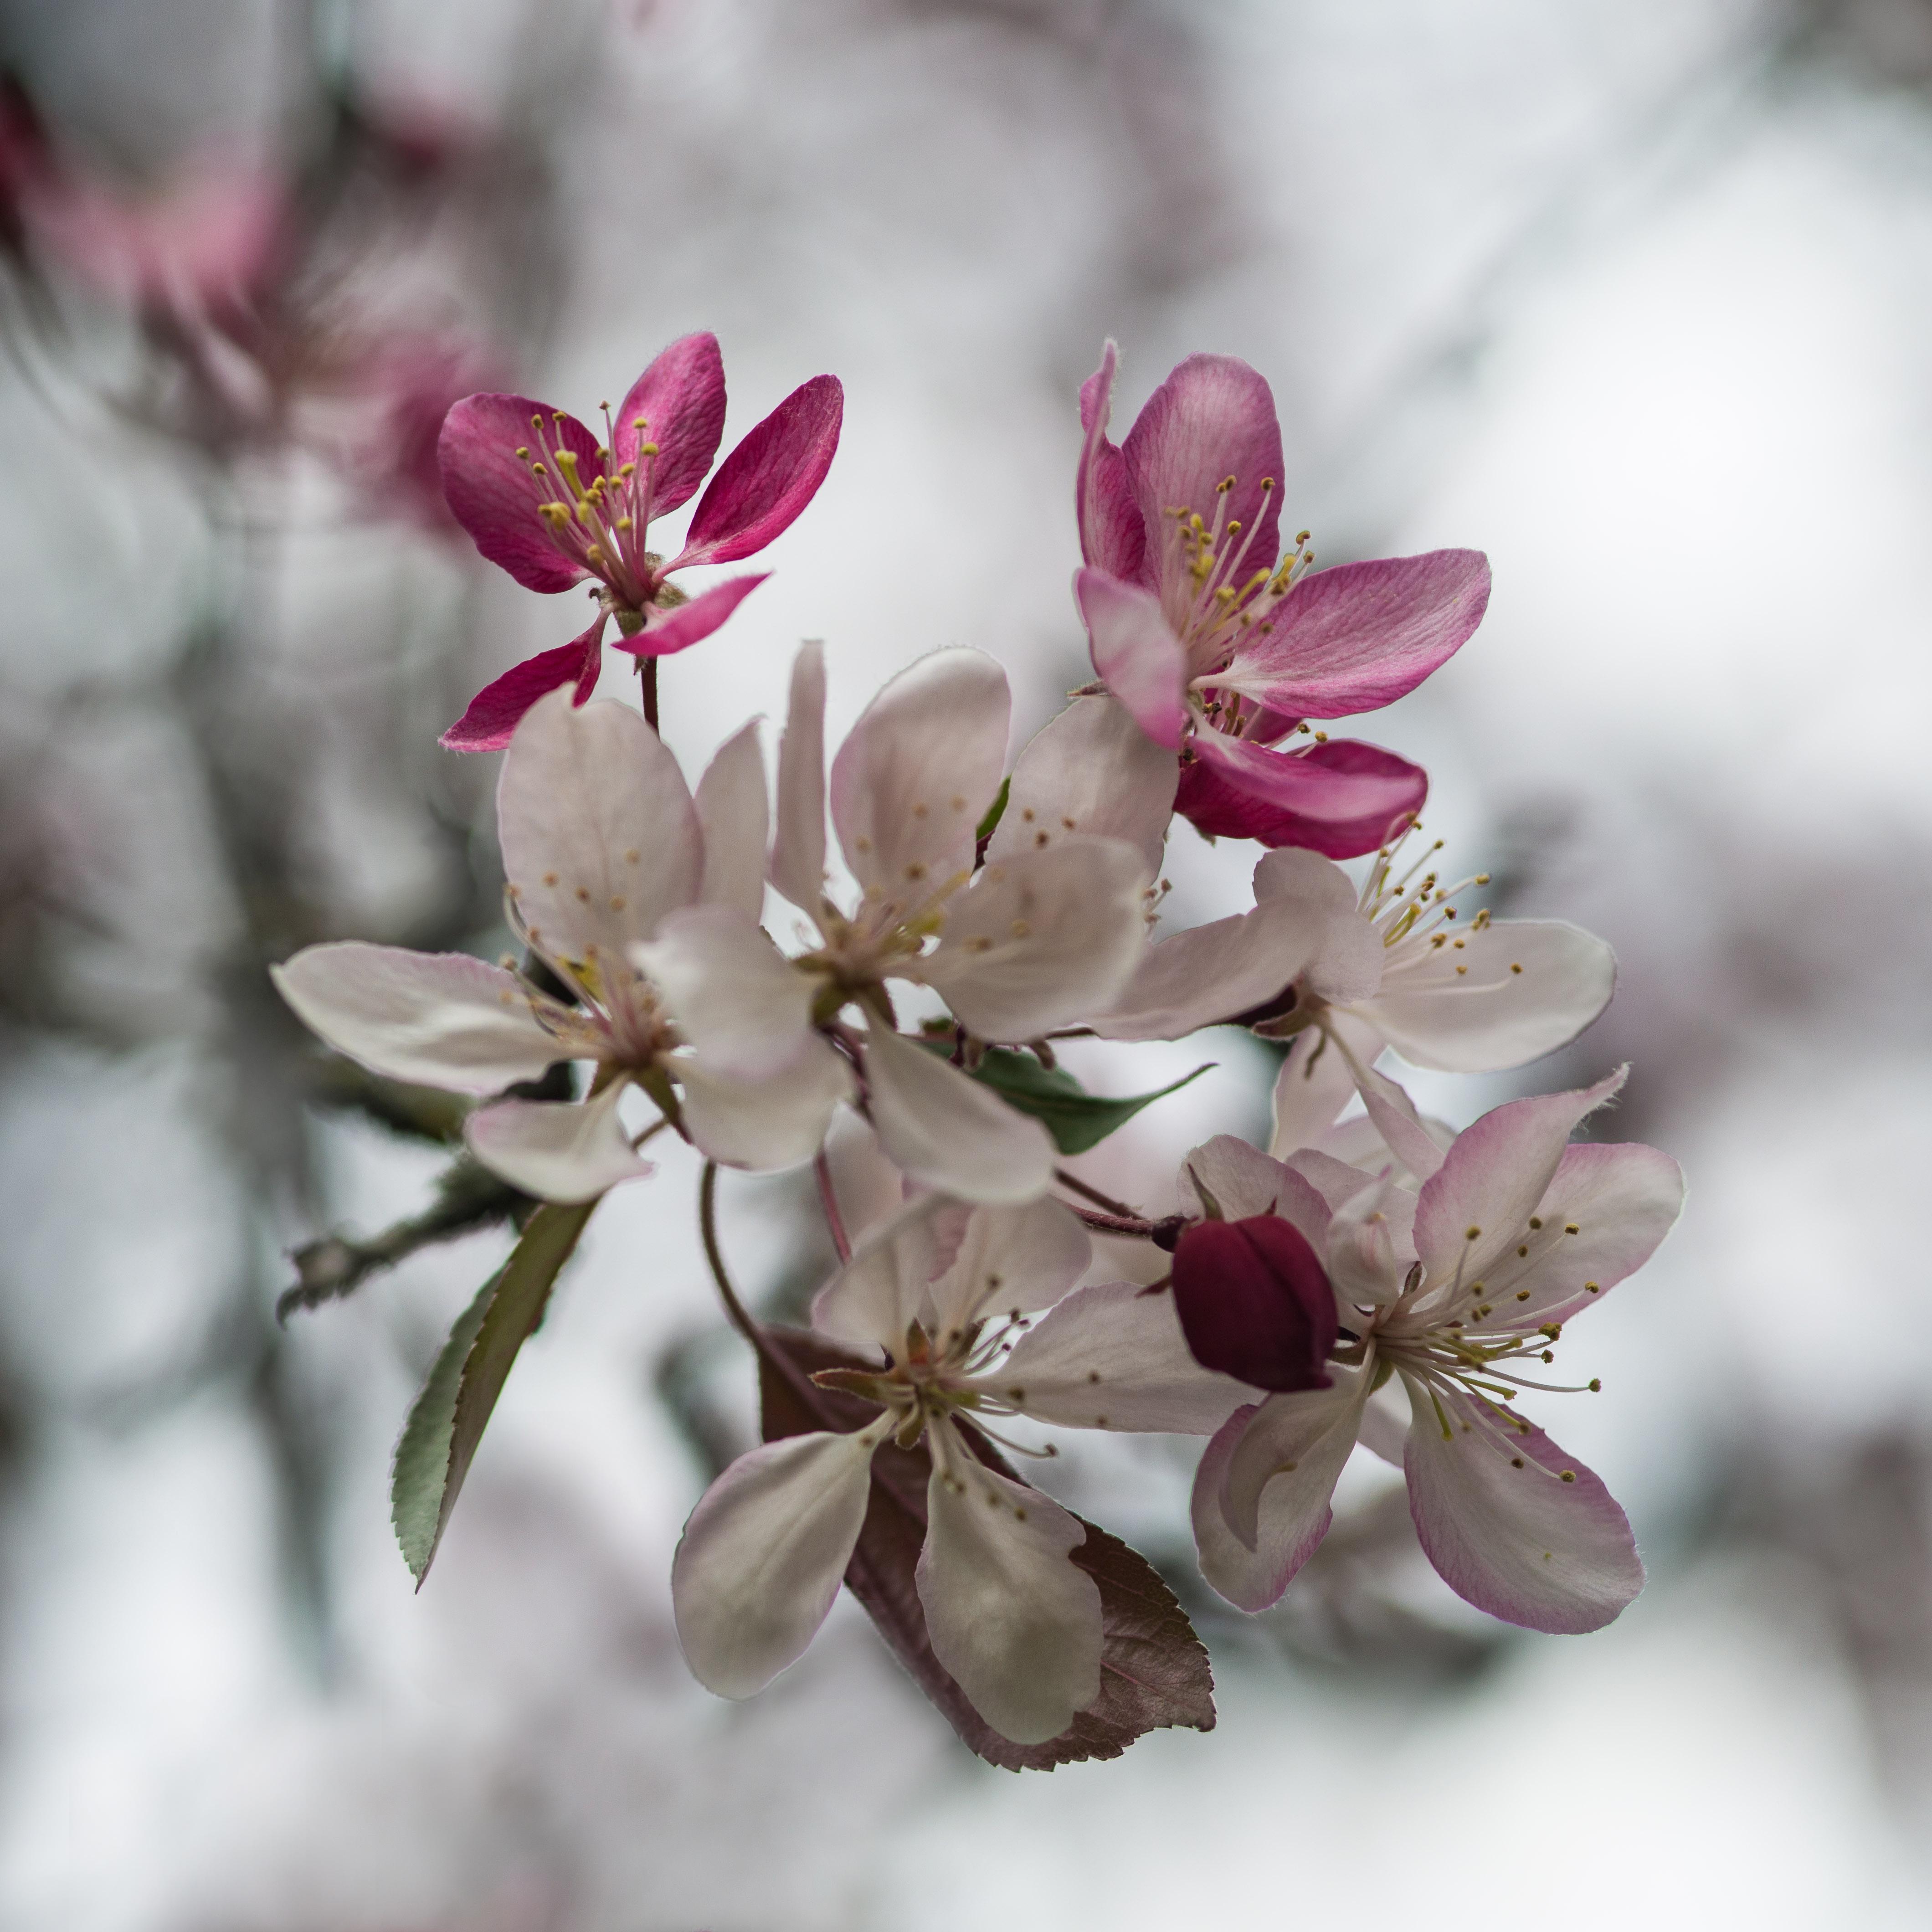 #cherryblossoms, #pennsylvania, #spring, #easter, #selectivefocus, #nikon